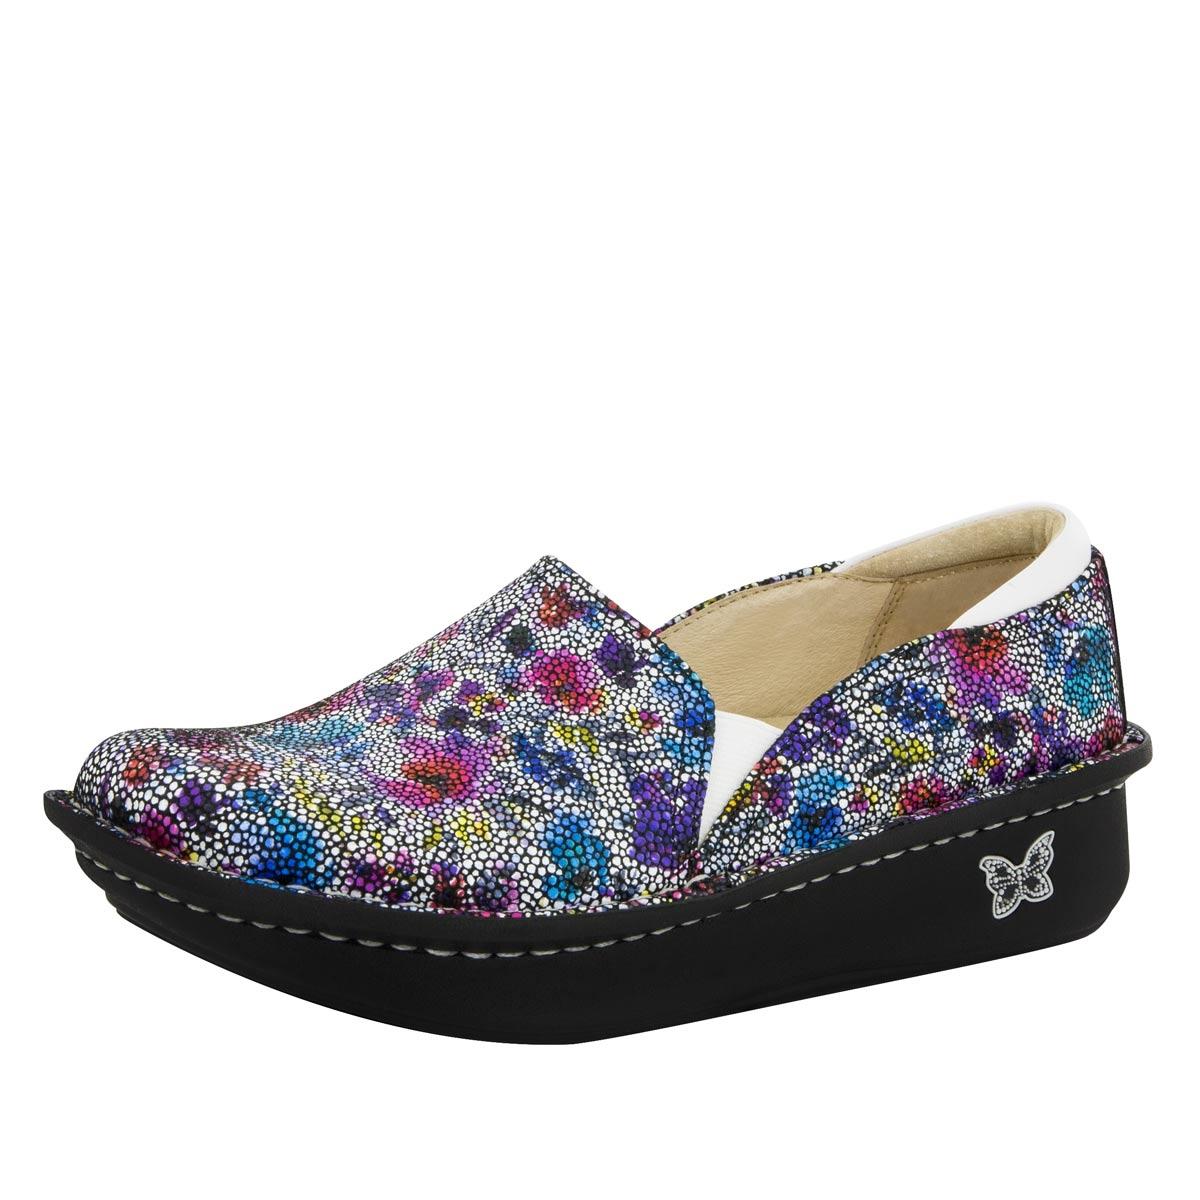 Alegria Shoes Debra Blissful